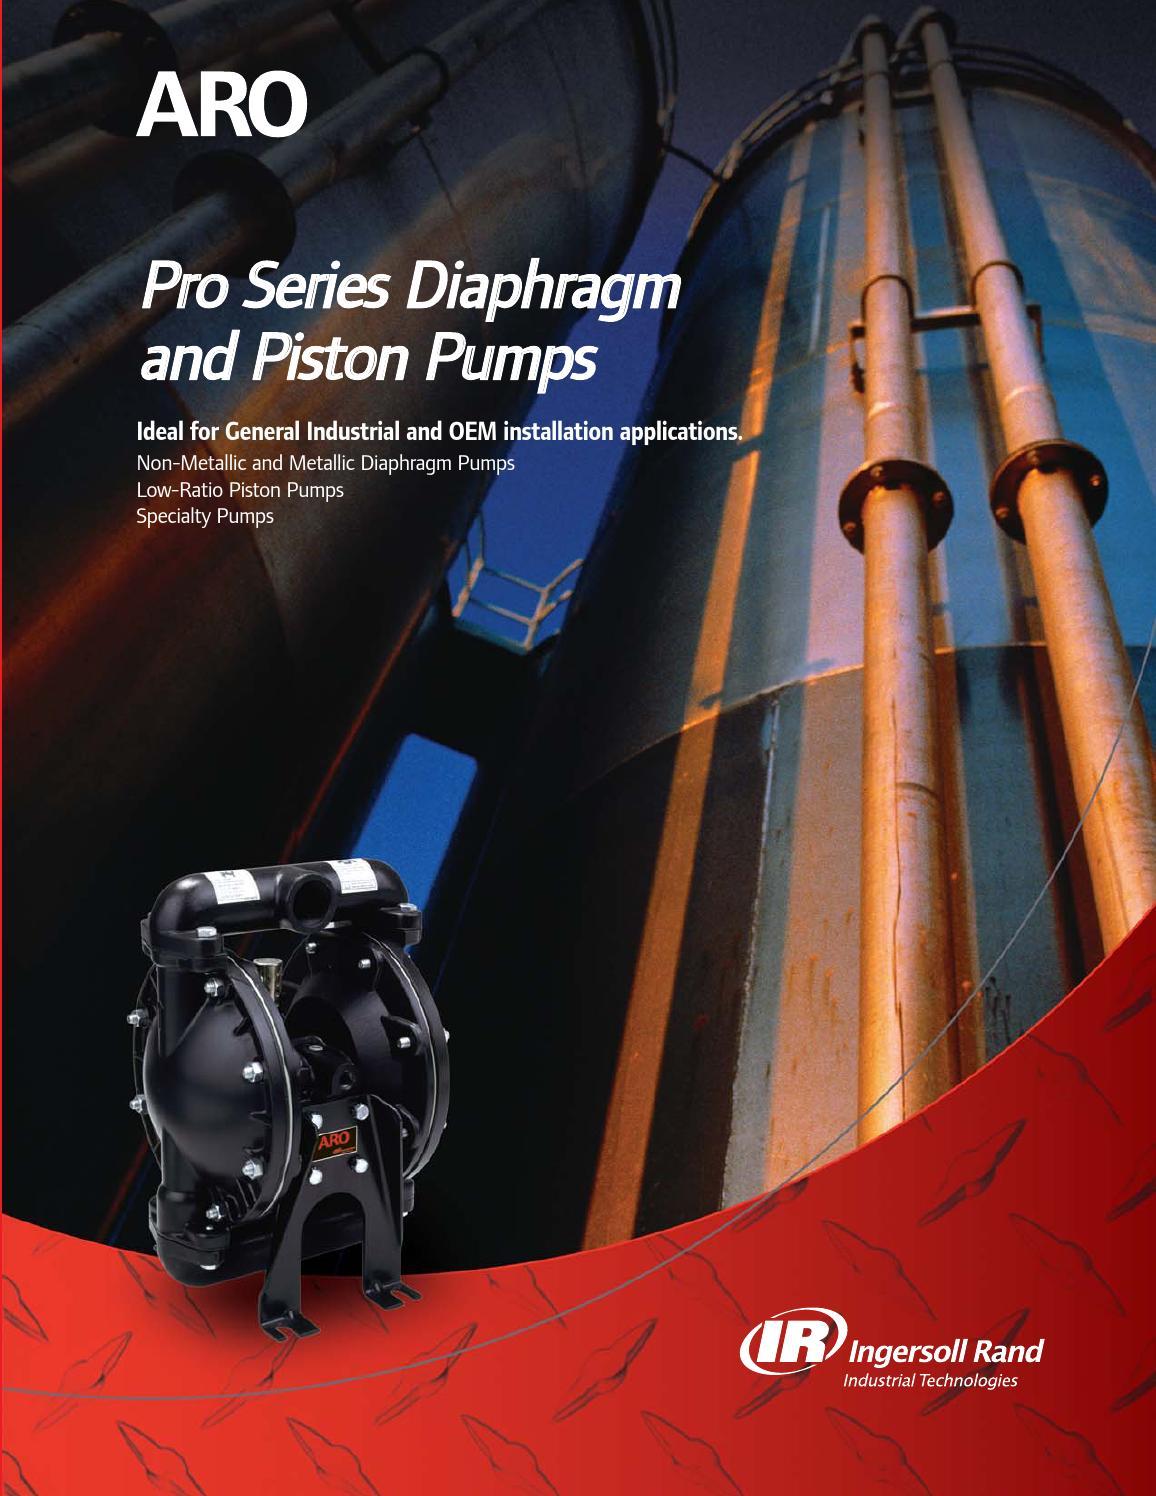 Bombas diafragma y pistón neu aro catalogo 0604 p (2009 10 20) by